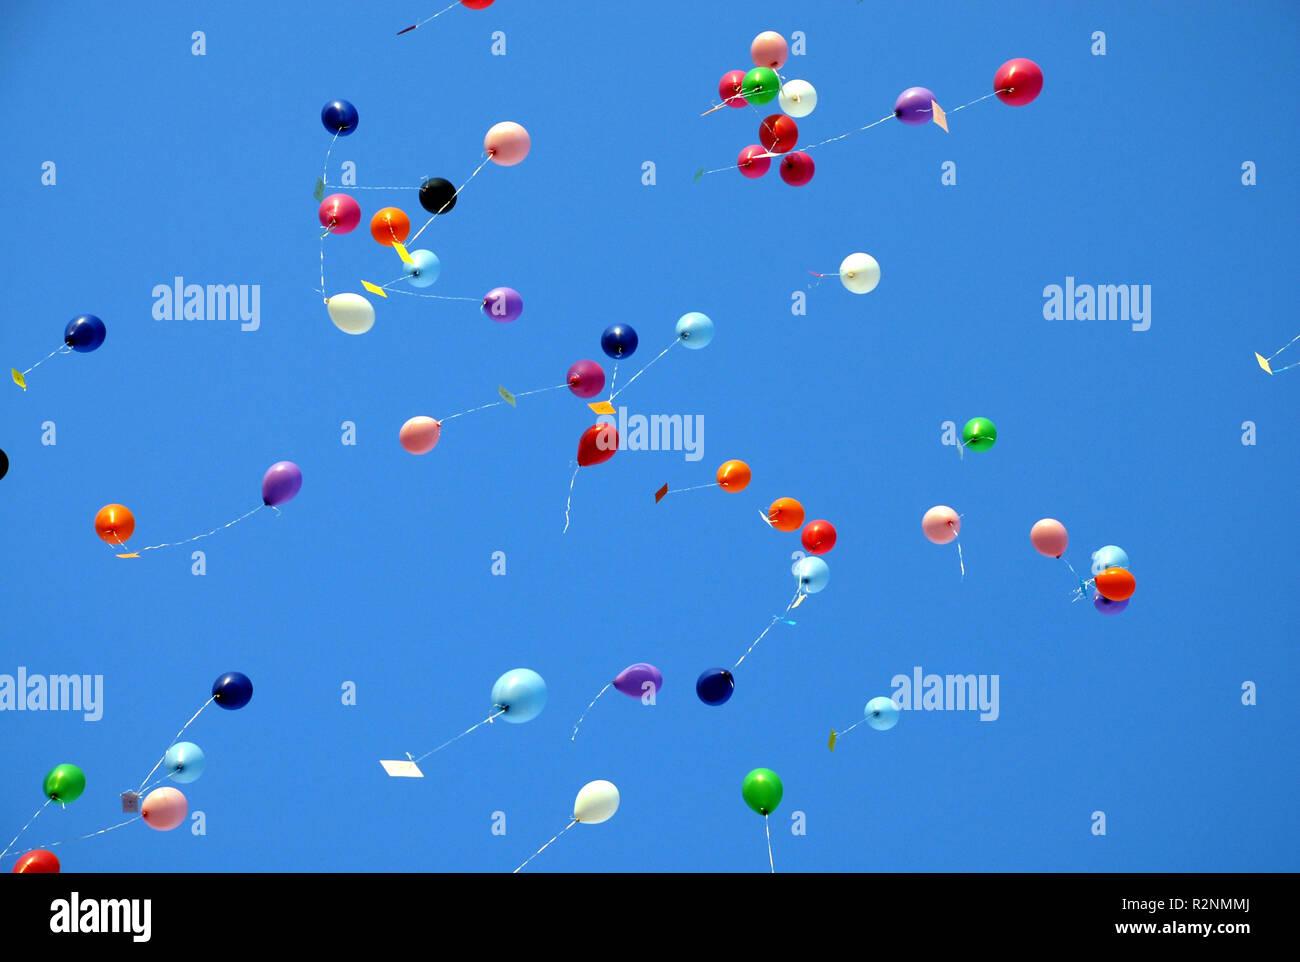 99 Balloons Stock Photo 225441346